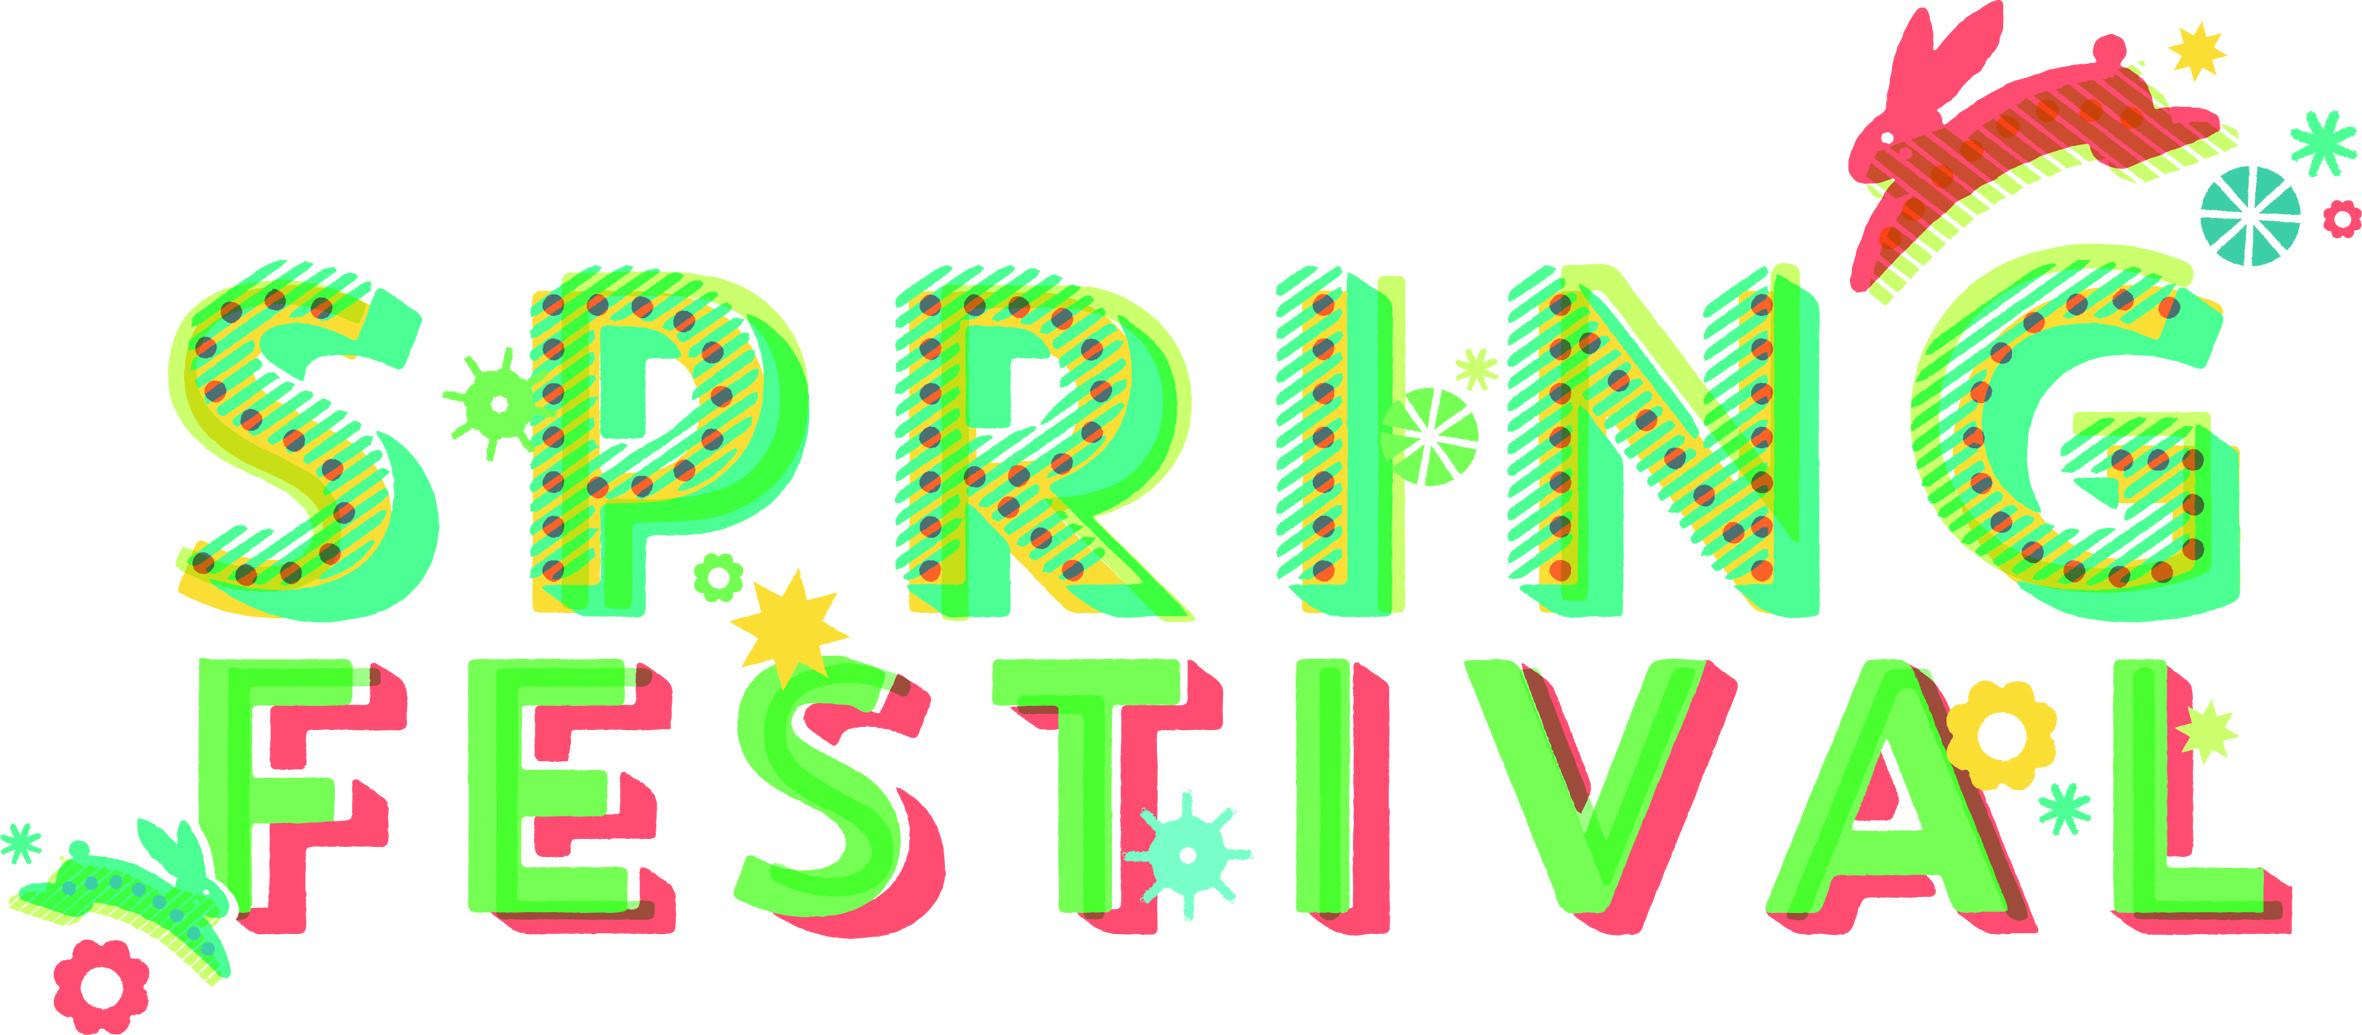 Spring Festival Clip Art.